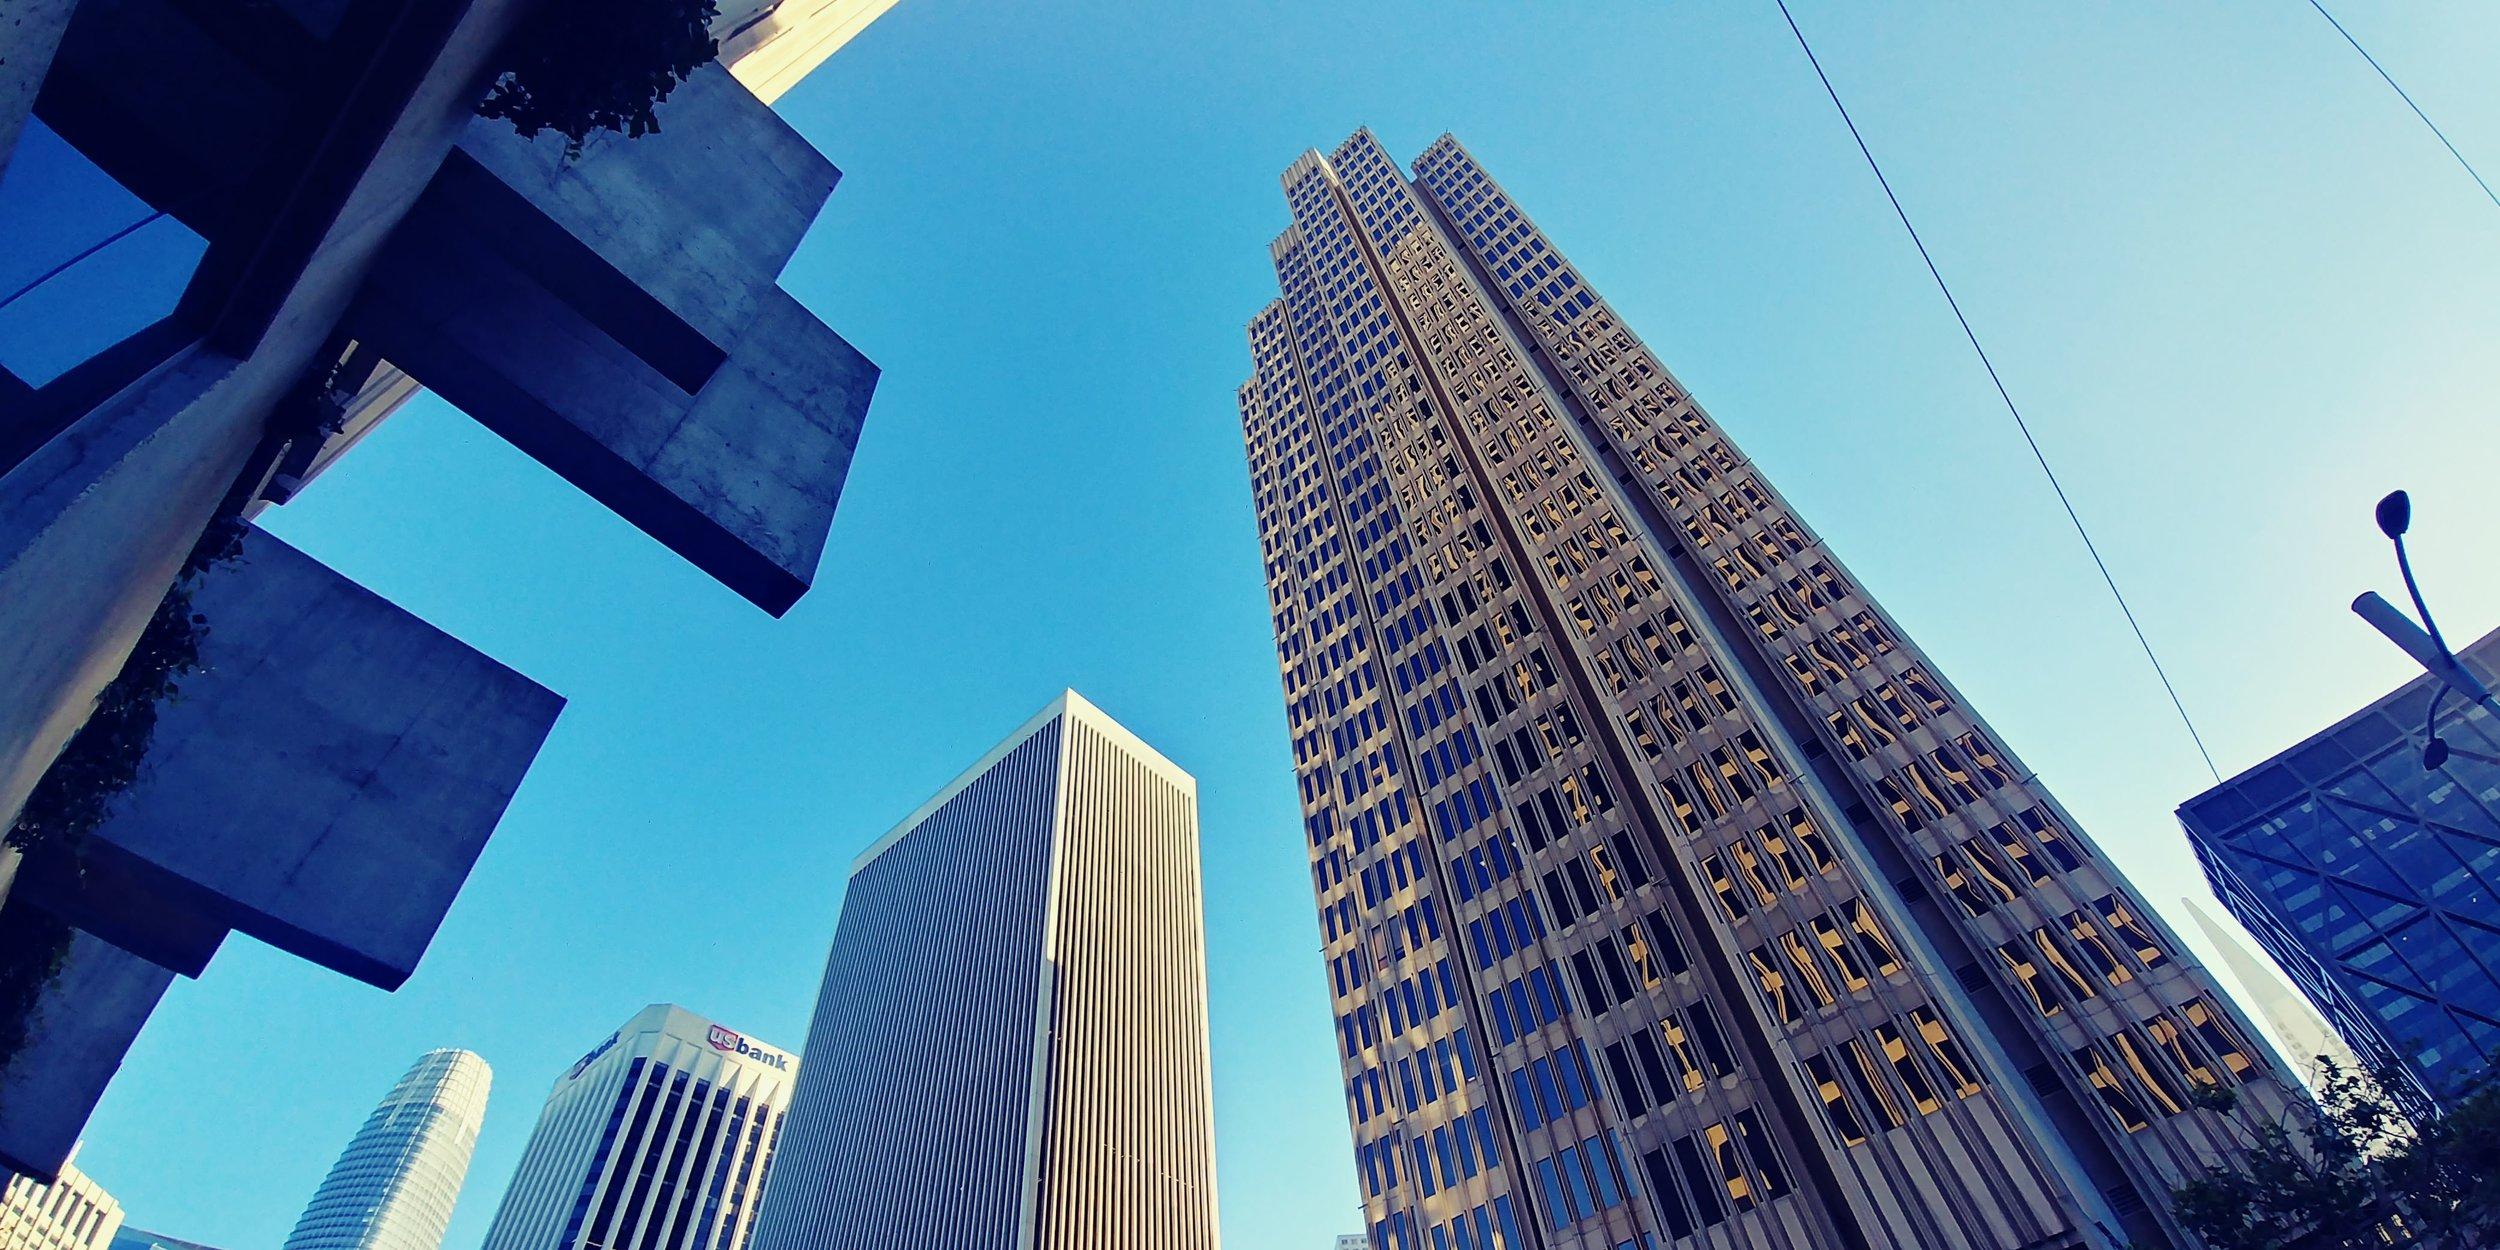 downtown-san-francisco-embarcadero-sf-california-ca-sandybythebay-sandy-by-the-bay-sf-food-photography-1.jpg